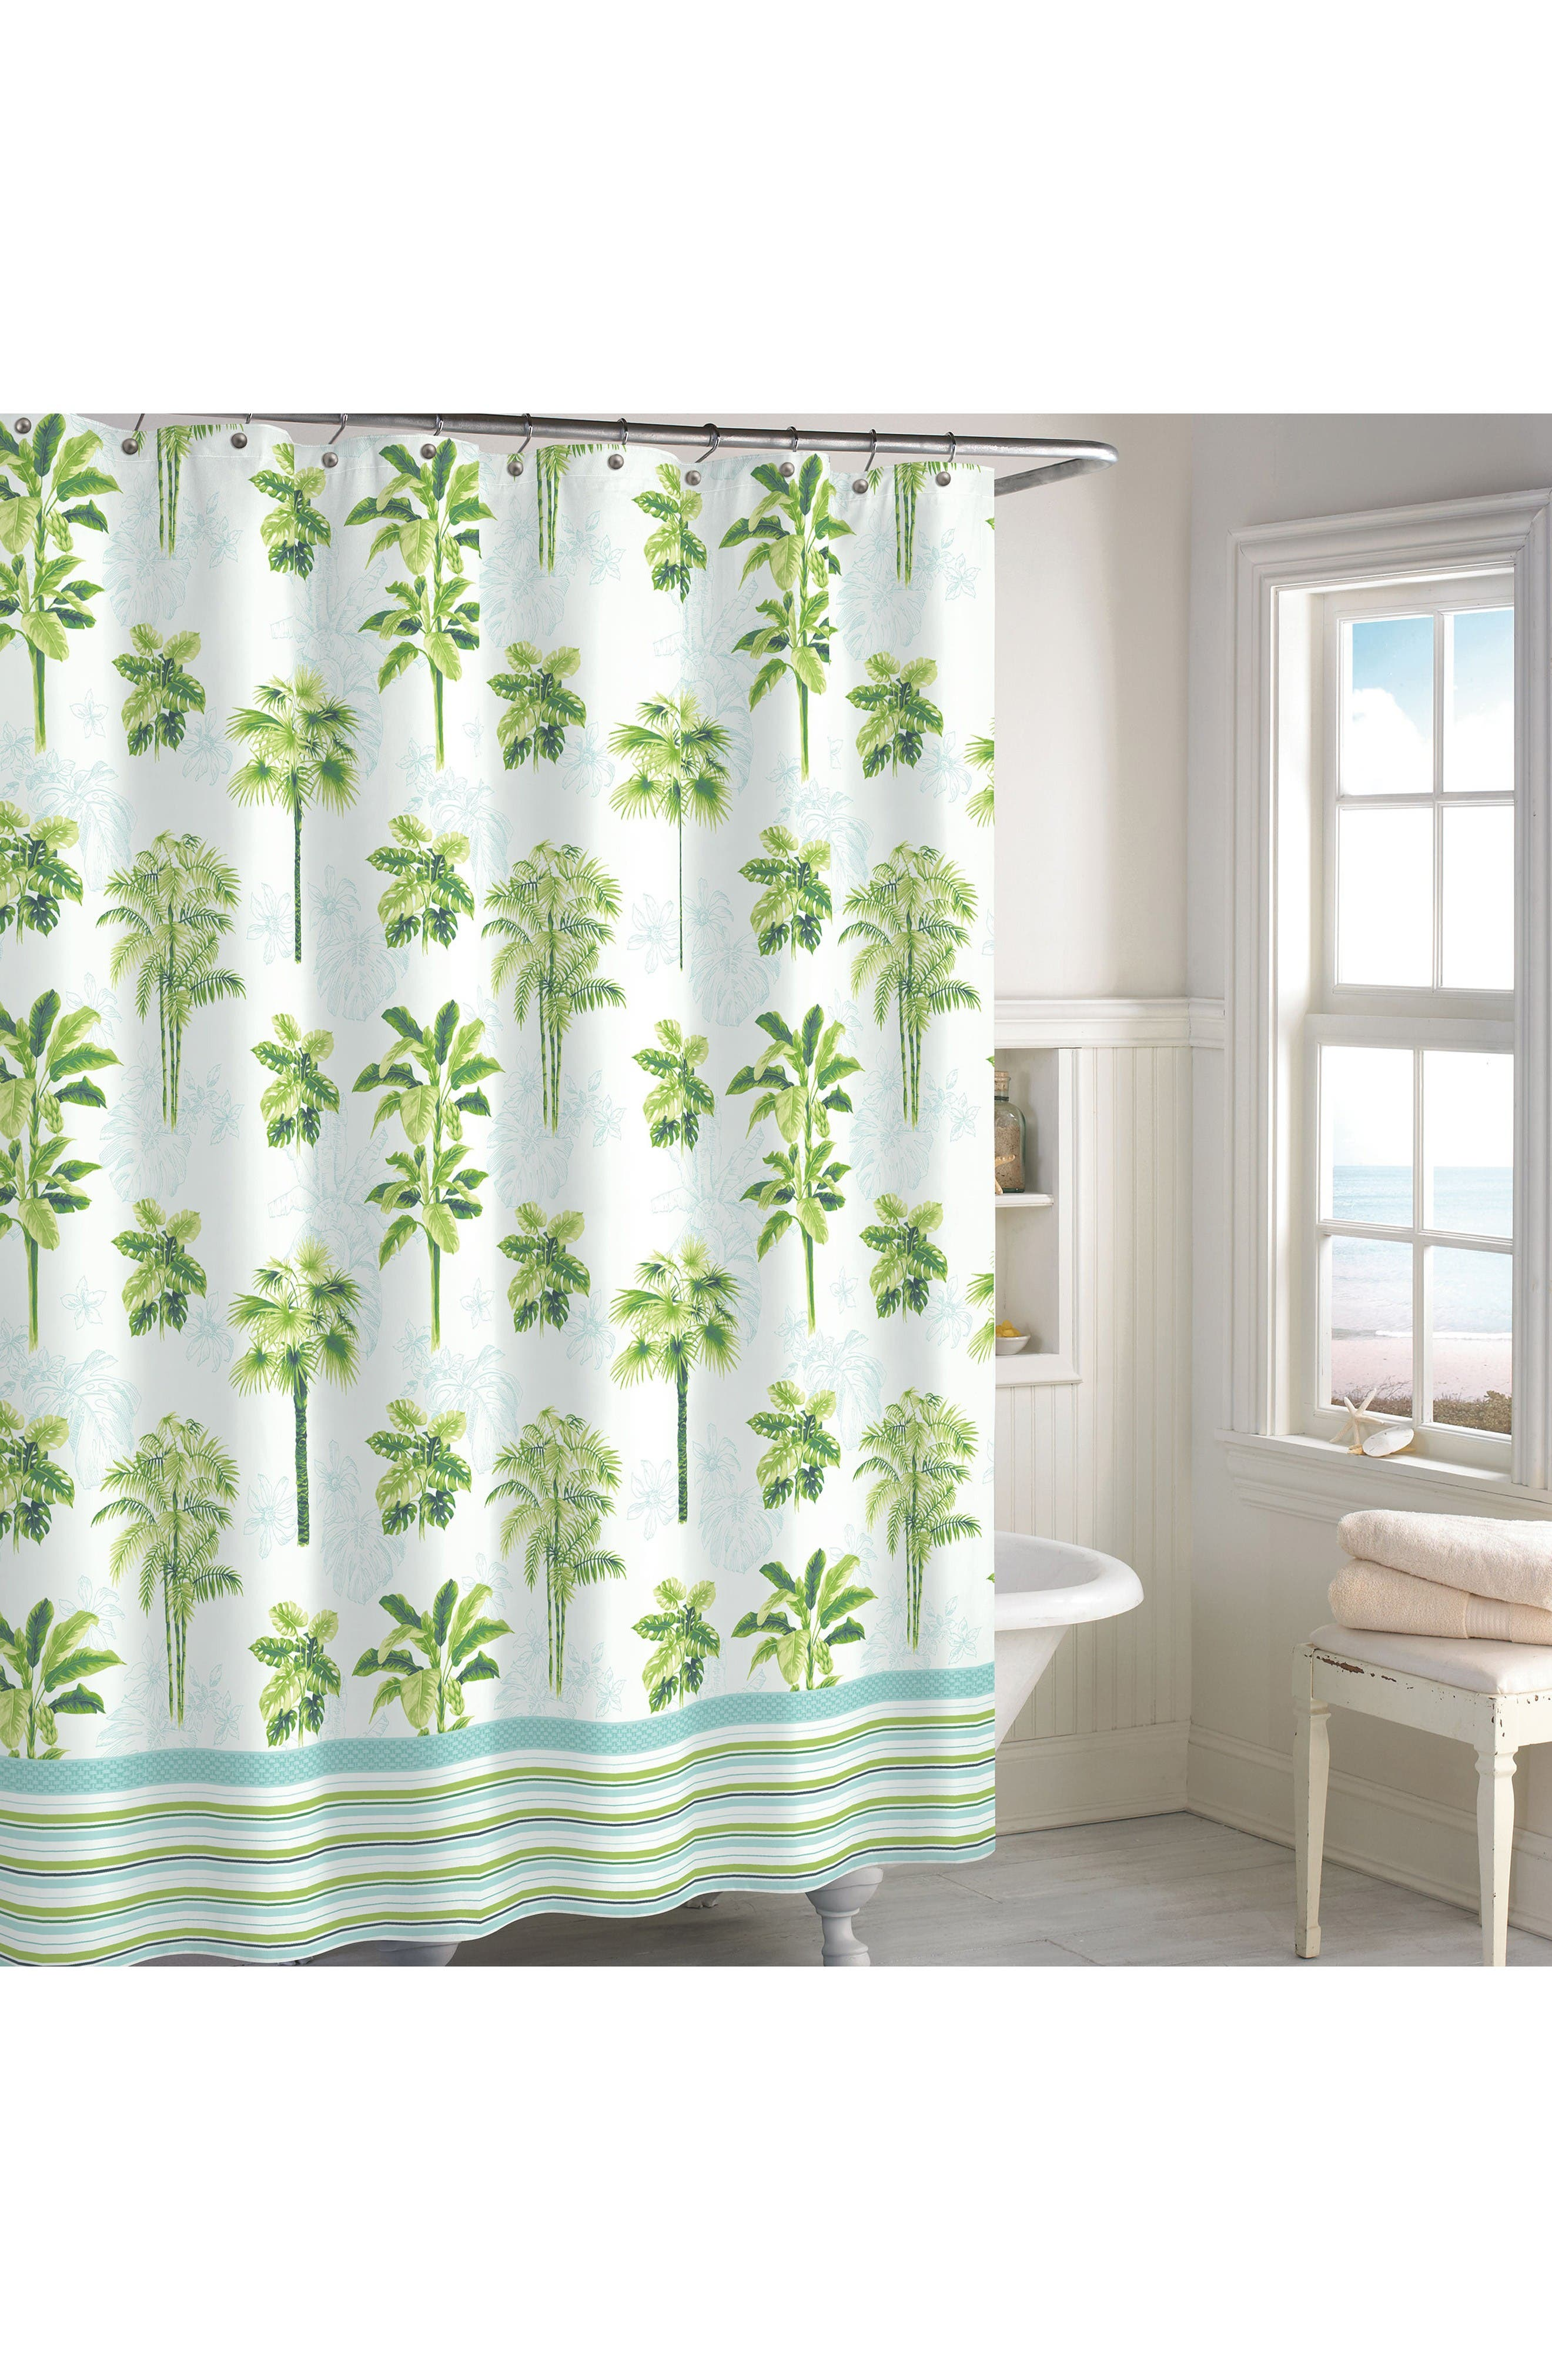 Tropical Palm Shower Curtain,                             Main thumbnail 1, color,                             Green